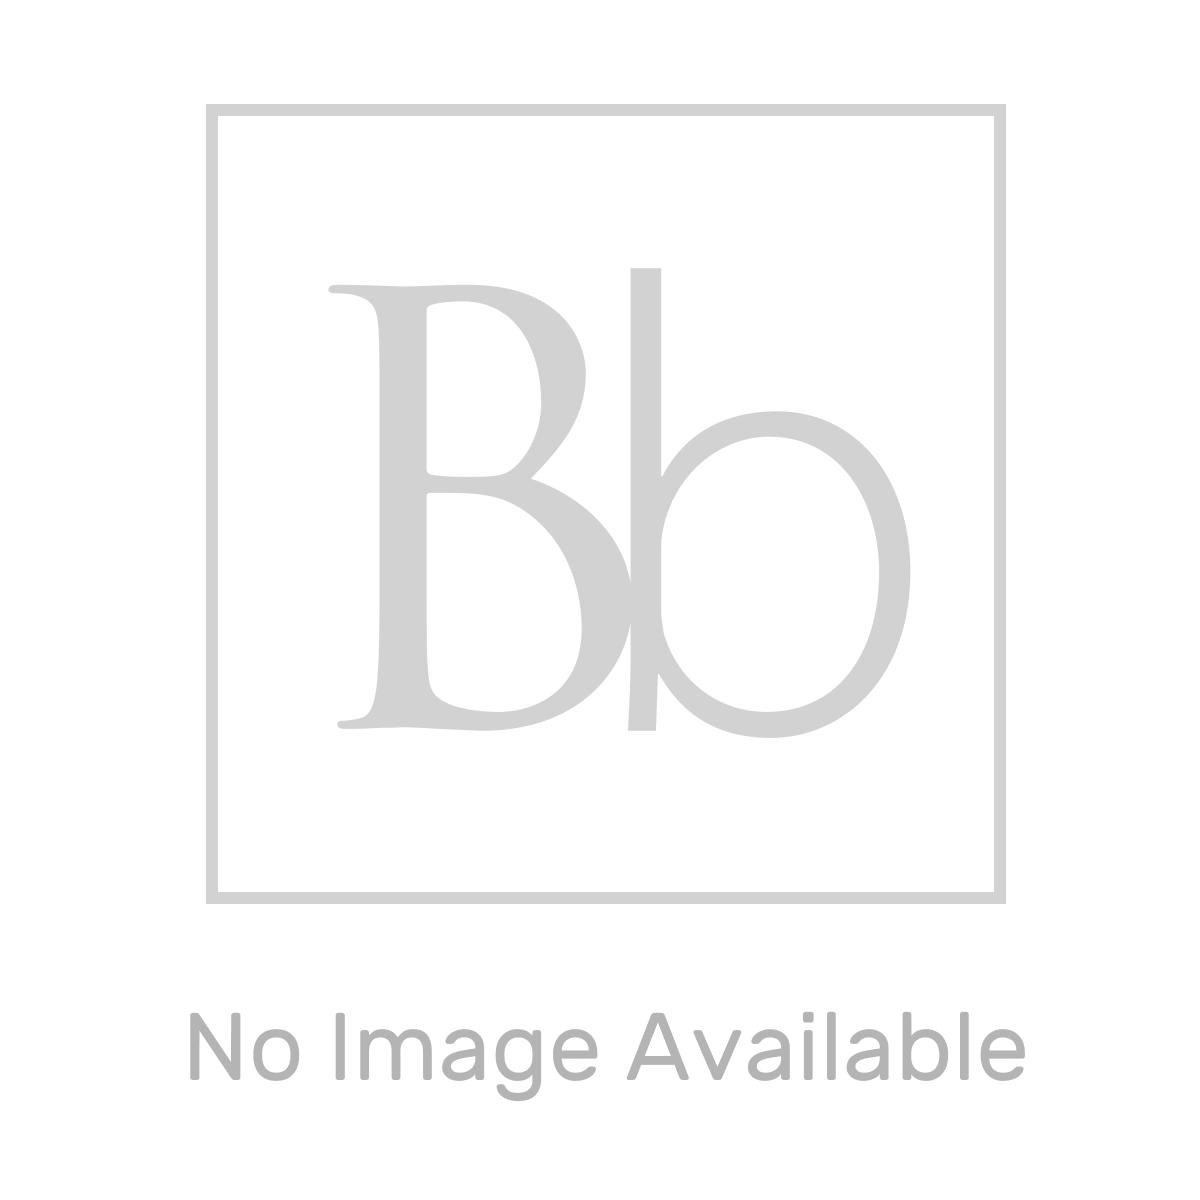 Stuart Turner 46416 Monsoon Standard Twin 3.0 Bar Positive Head Pump Left